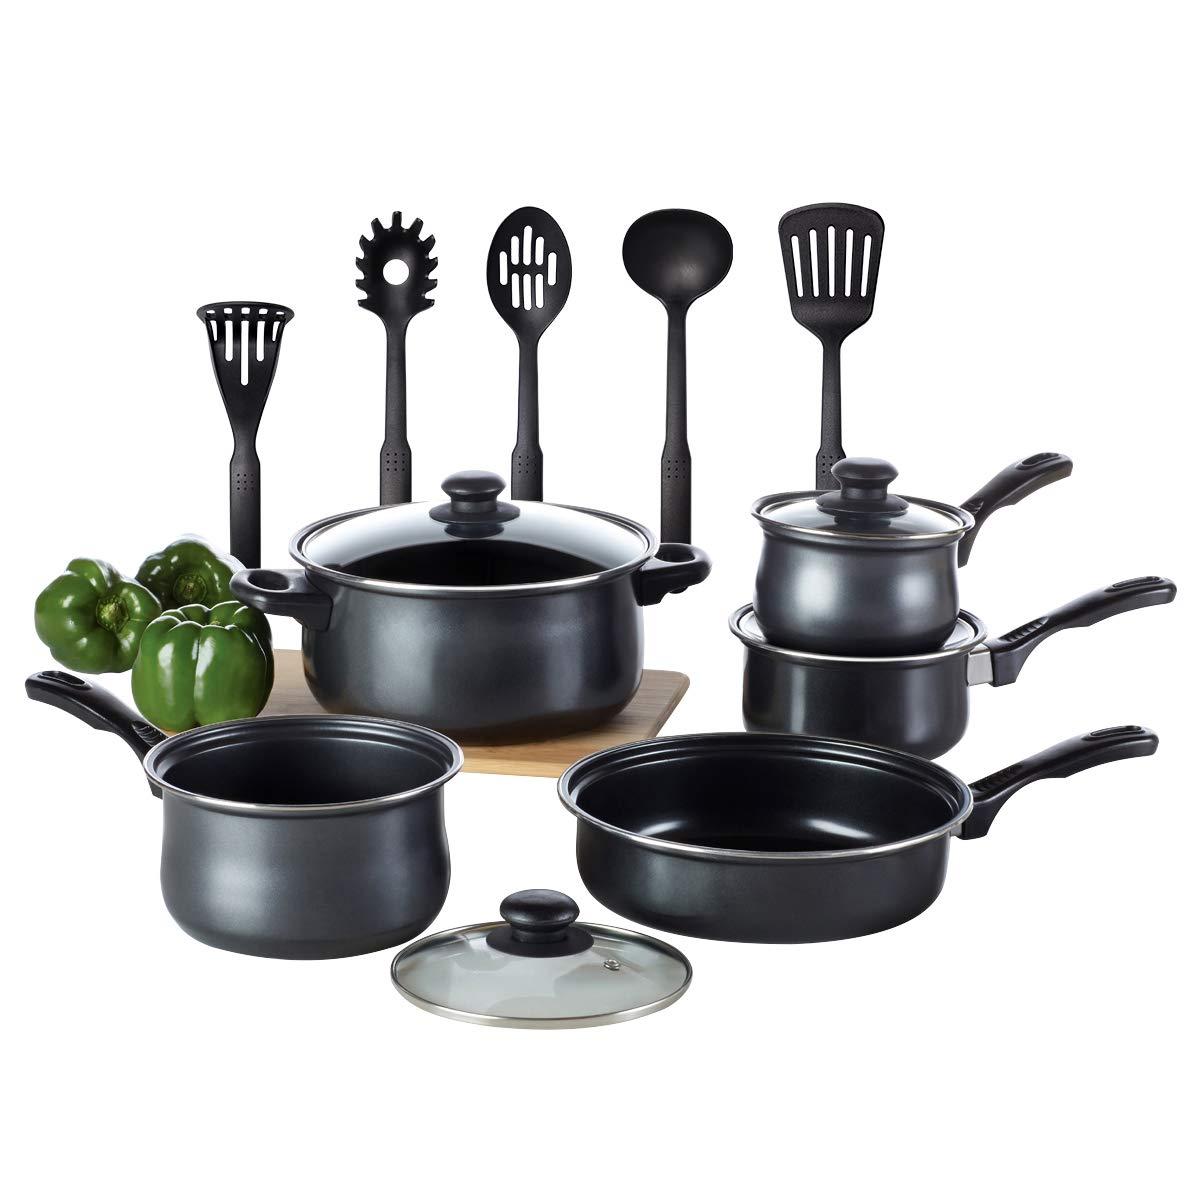 Kitchen Cookware Set, TOPTIER 14 Pieces Nonstick Kitchen Pots and Pans Set with 3 Saucepans, 1 Dutch Oven, 1 Open Skillet and 5 Nonstick Cooking Utensils, Black